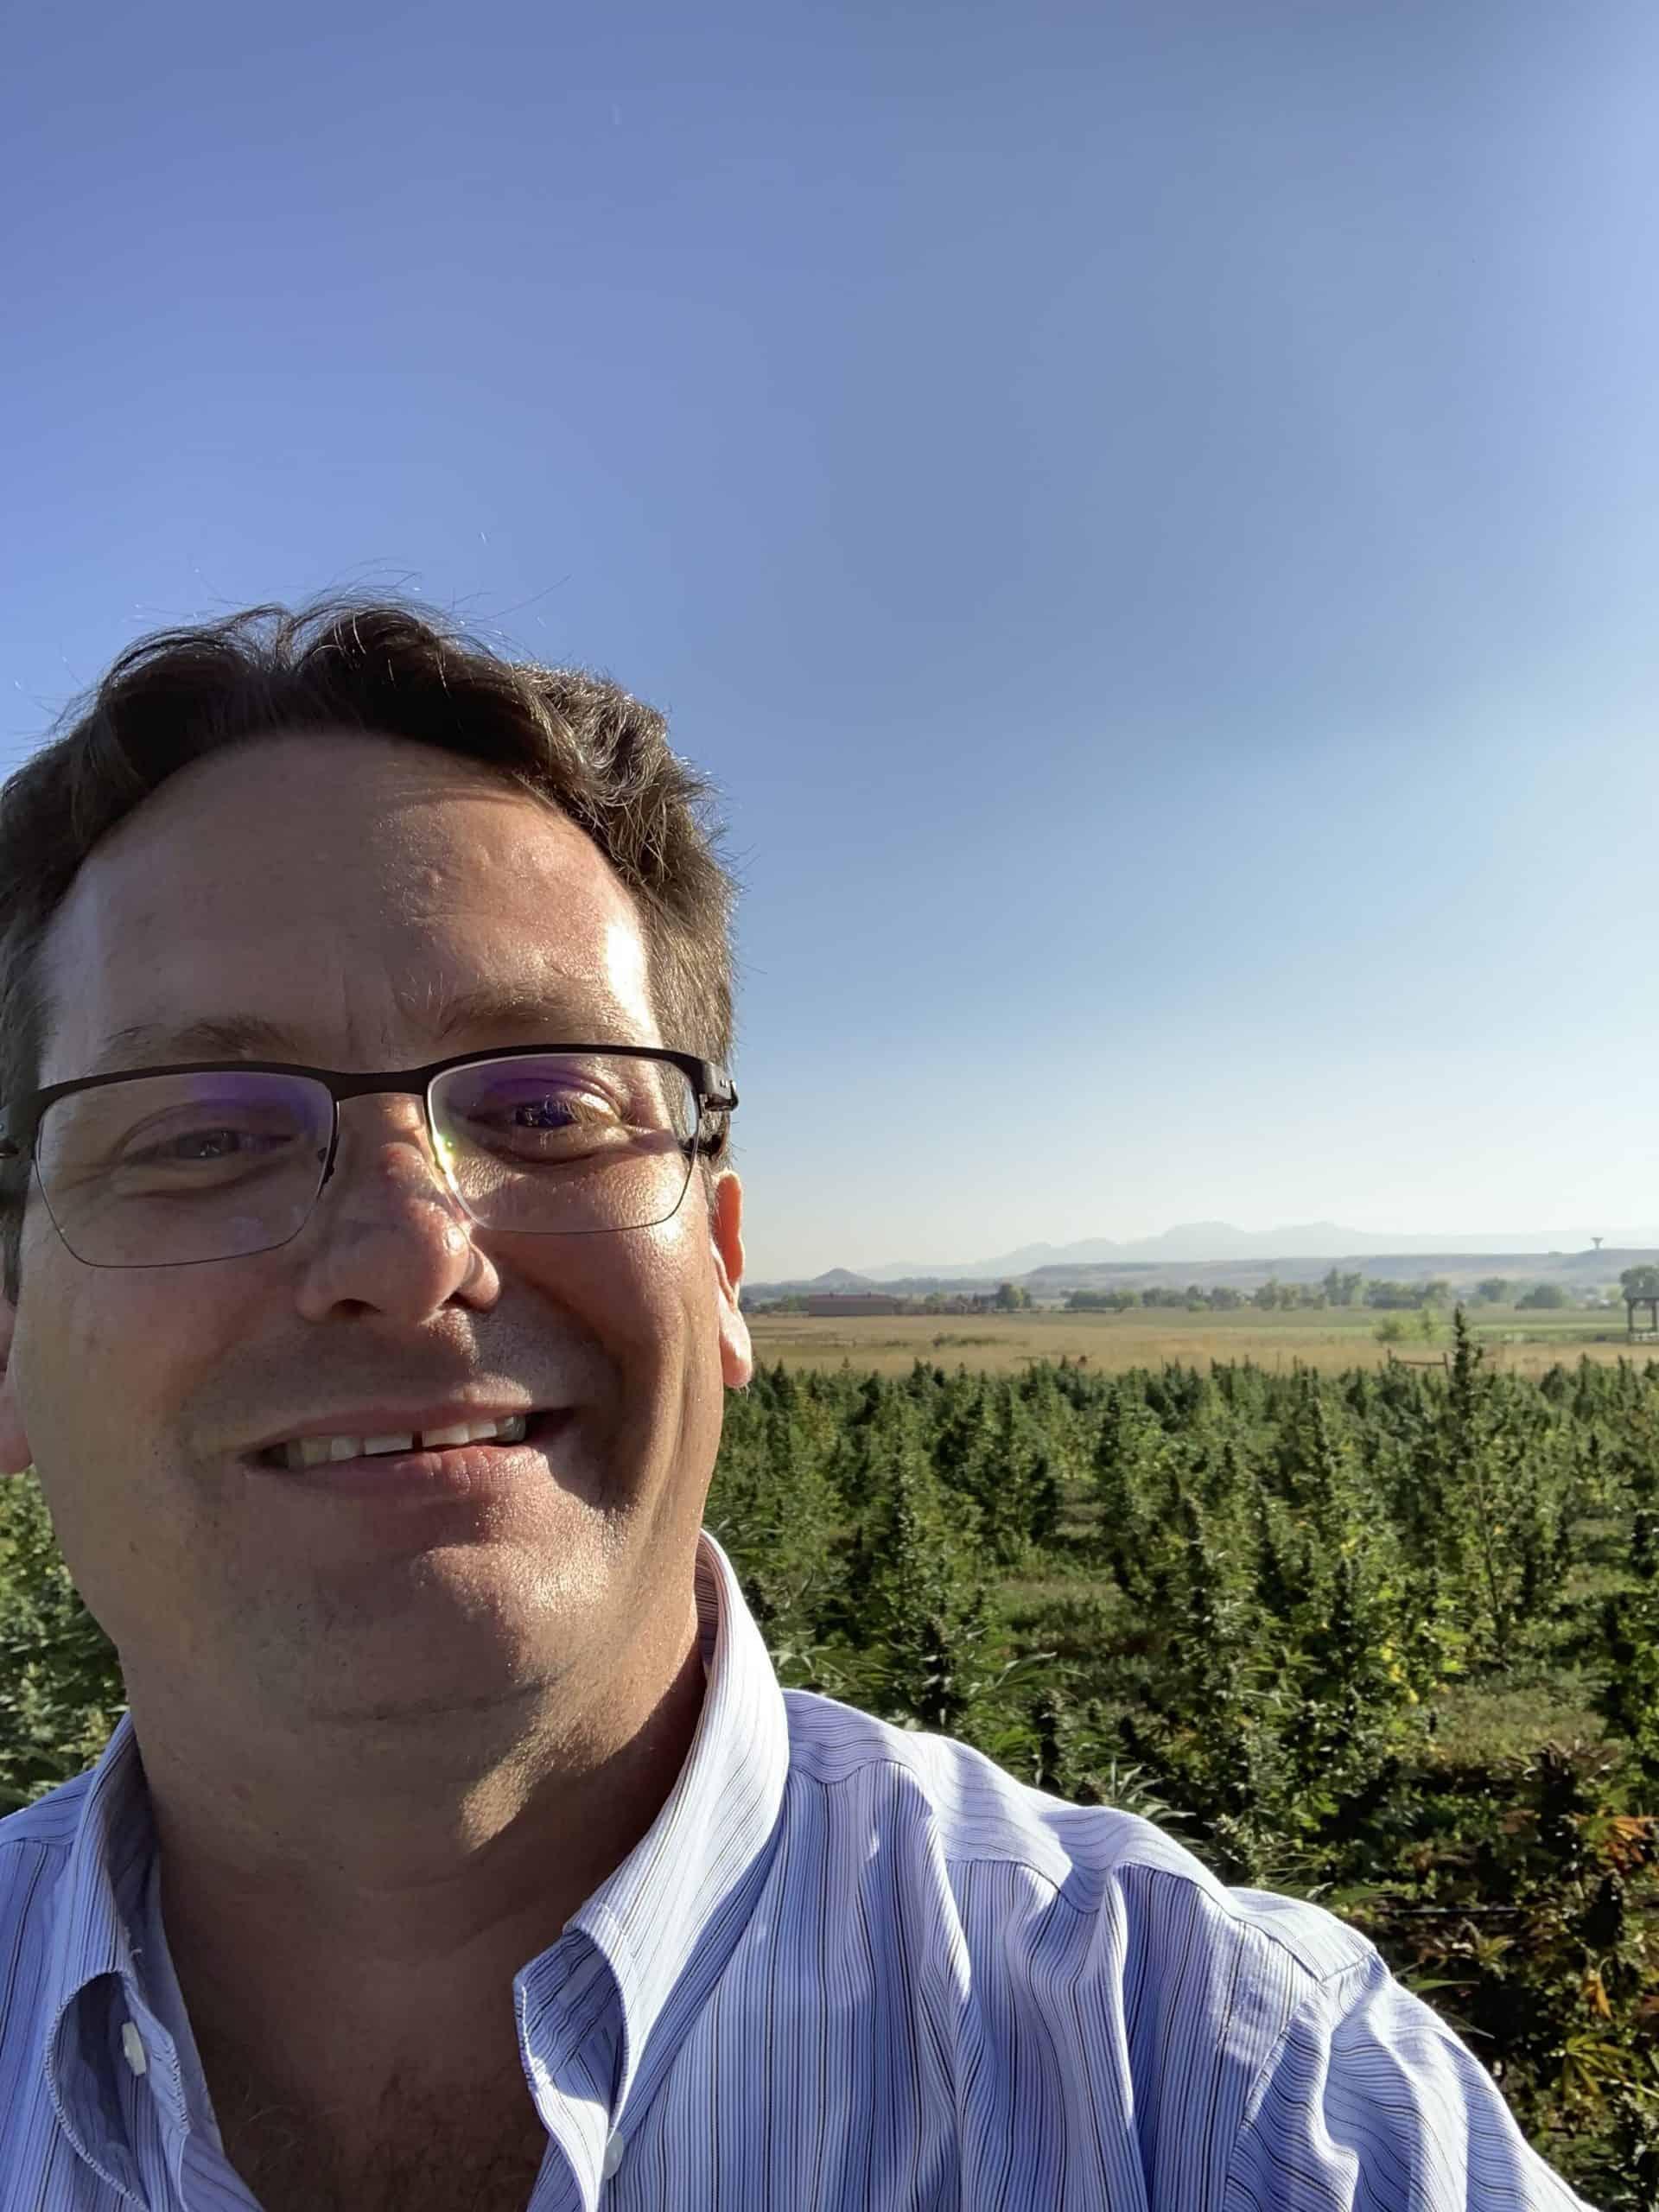 A LEGAL LABYRINTH: FRANK ROBISON NAVIGATES HEMP REGULATION